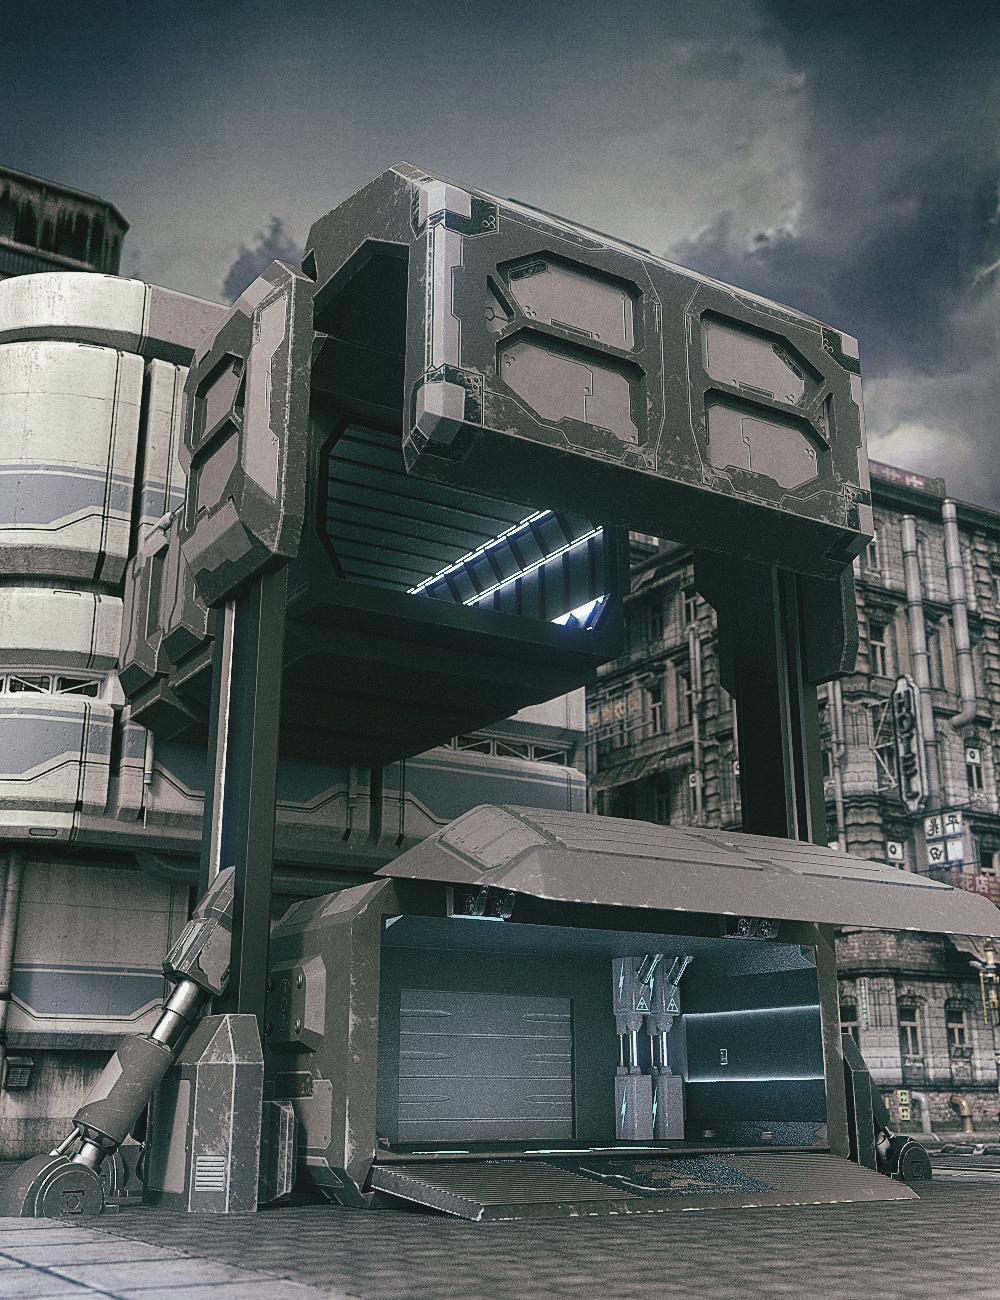 X-BIT Future Space Transmission Warehouse by: X-BIT, 3D Models by Daz 3D